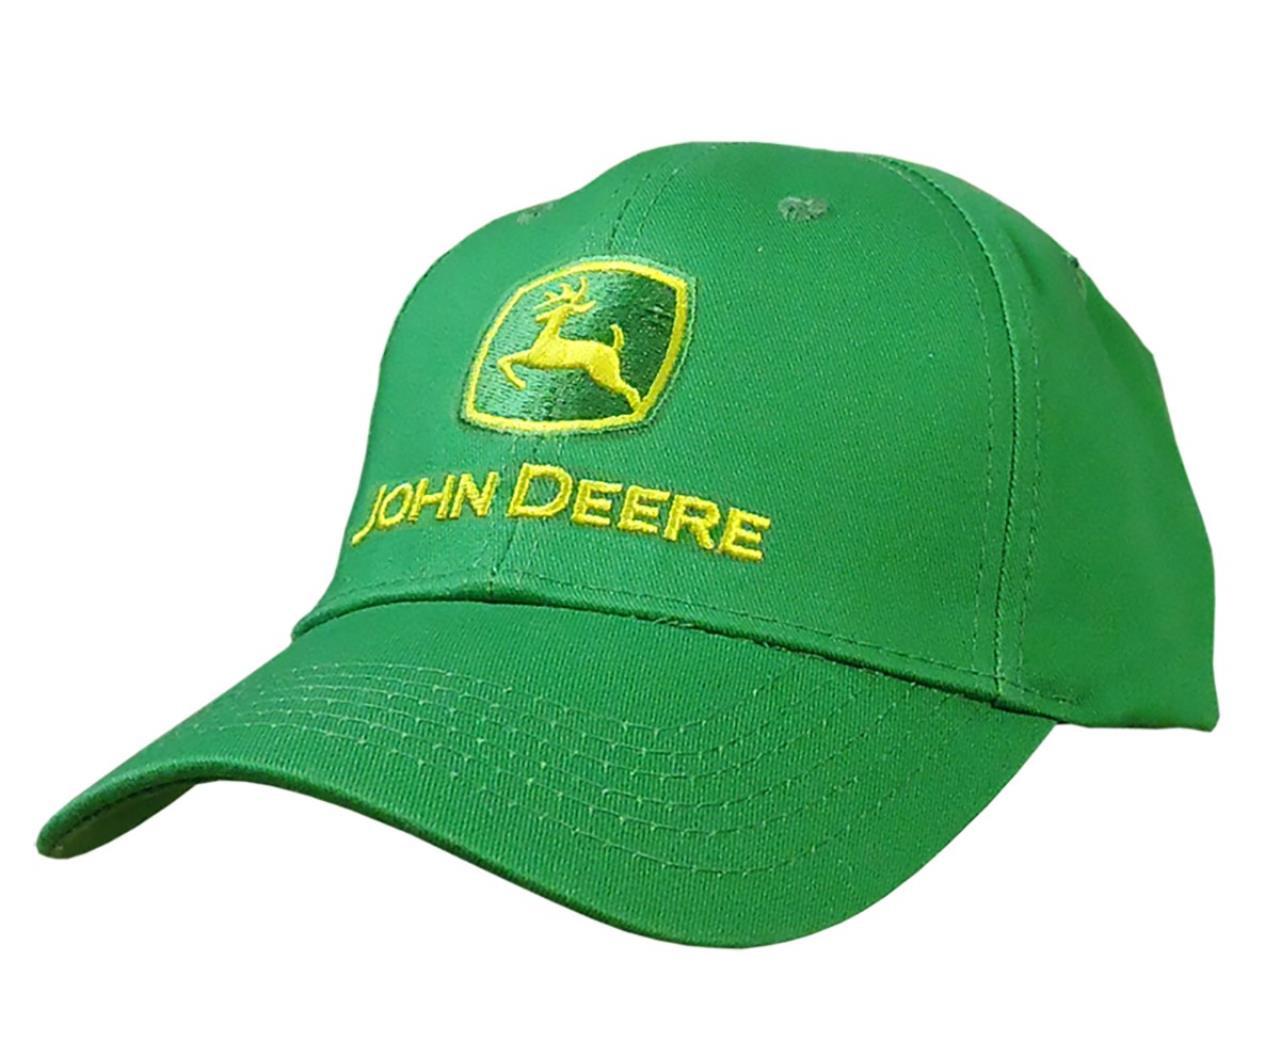 John Deere børne kasket grøn